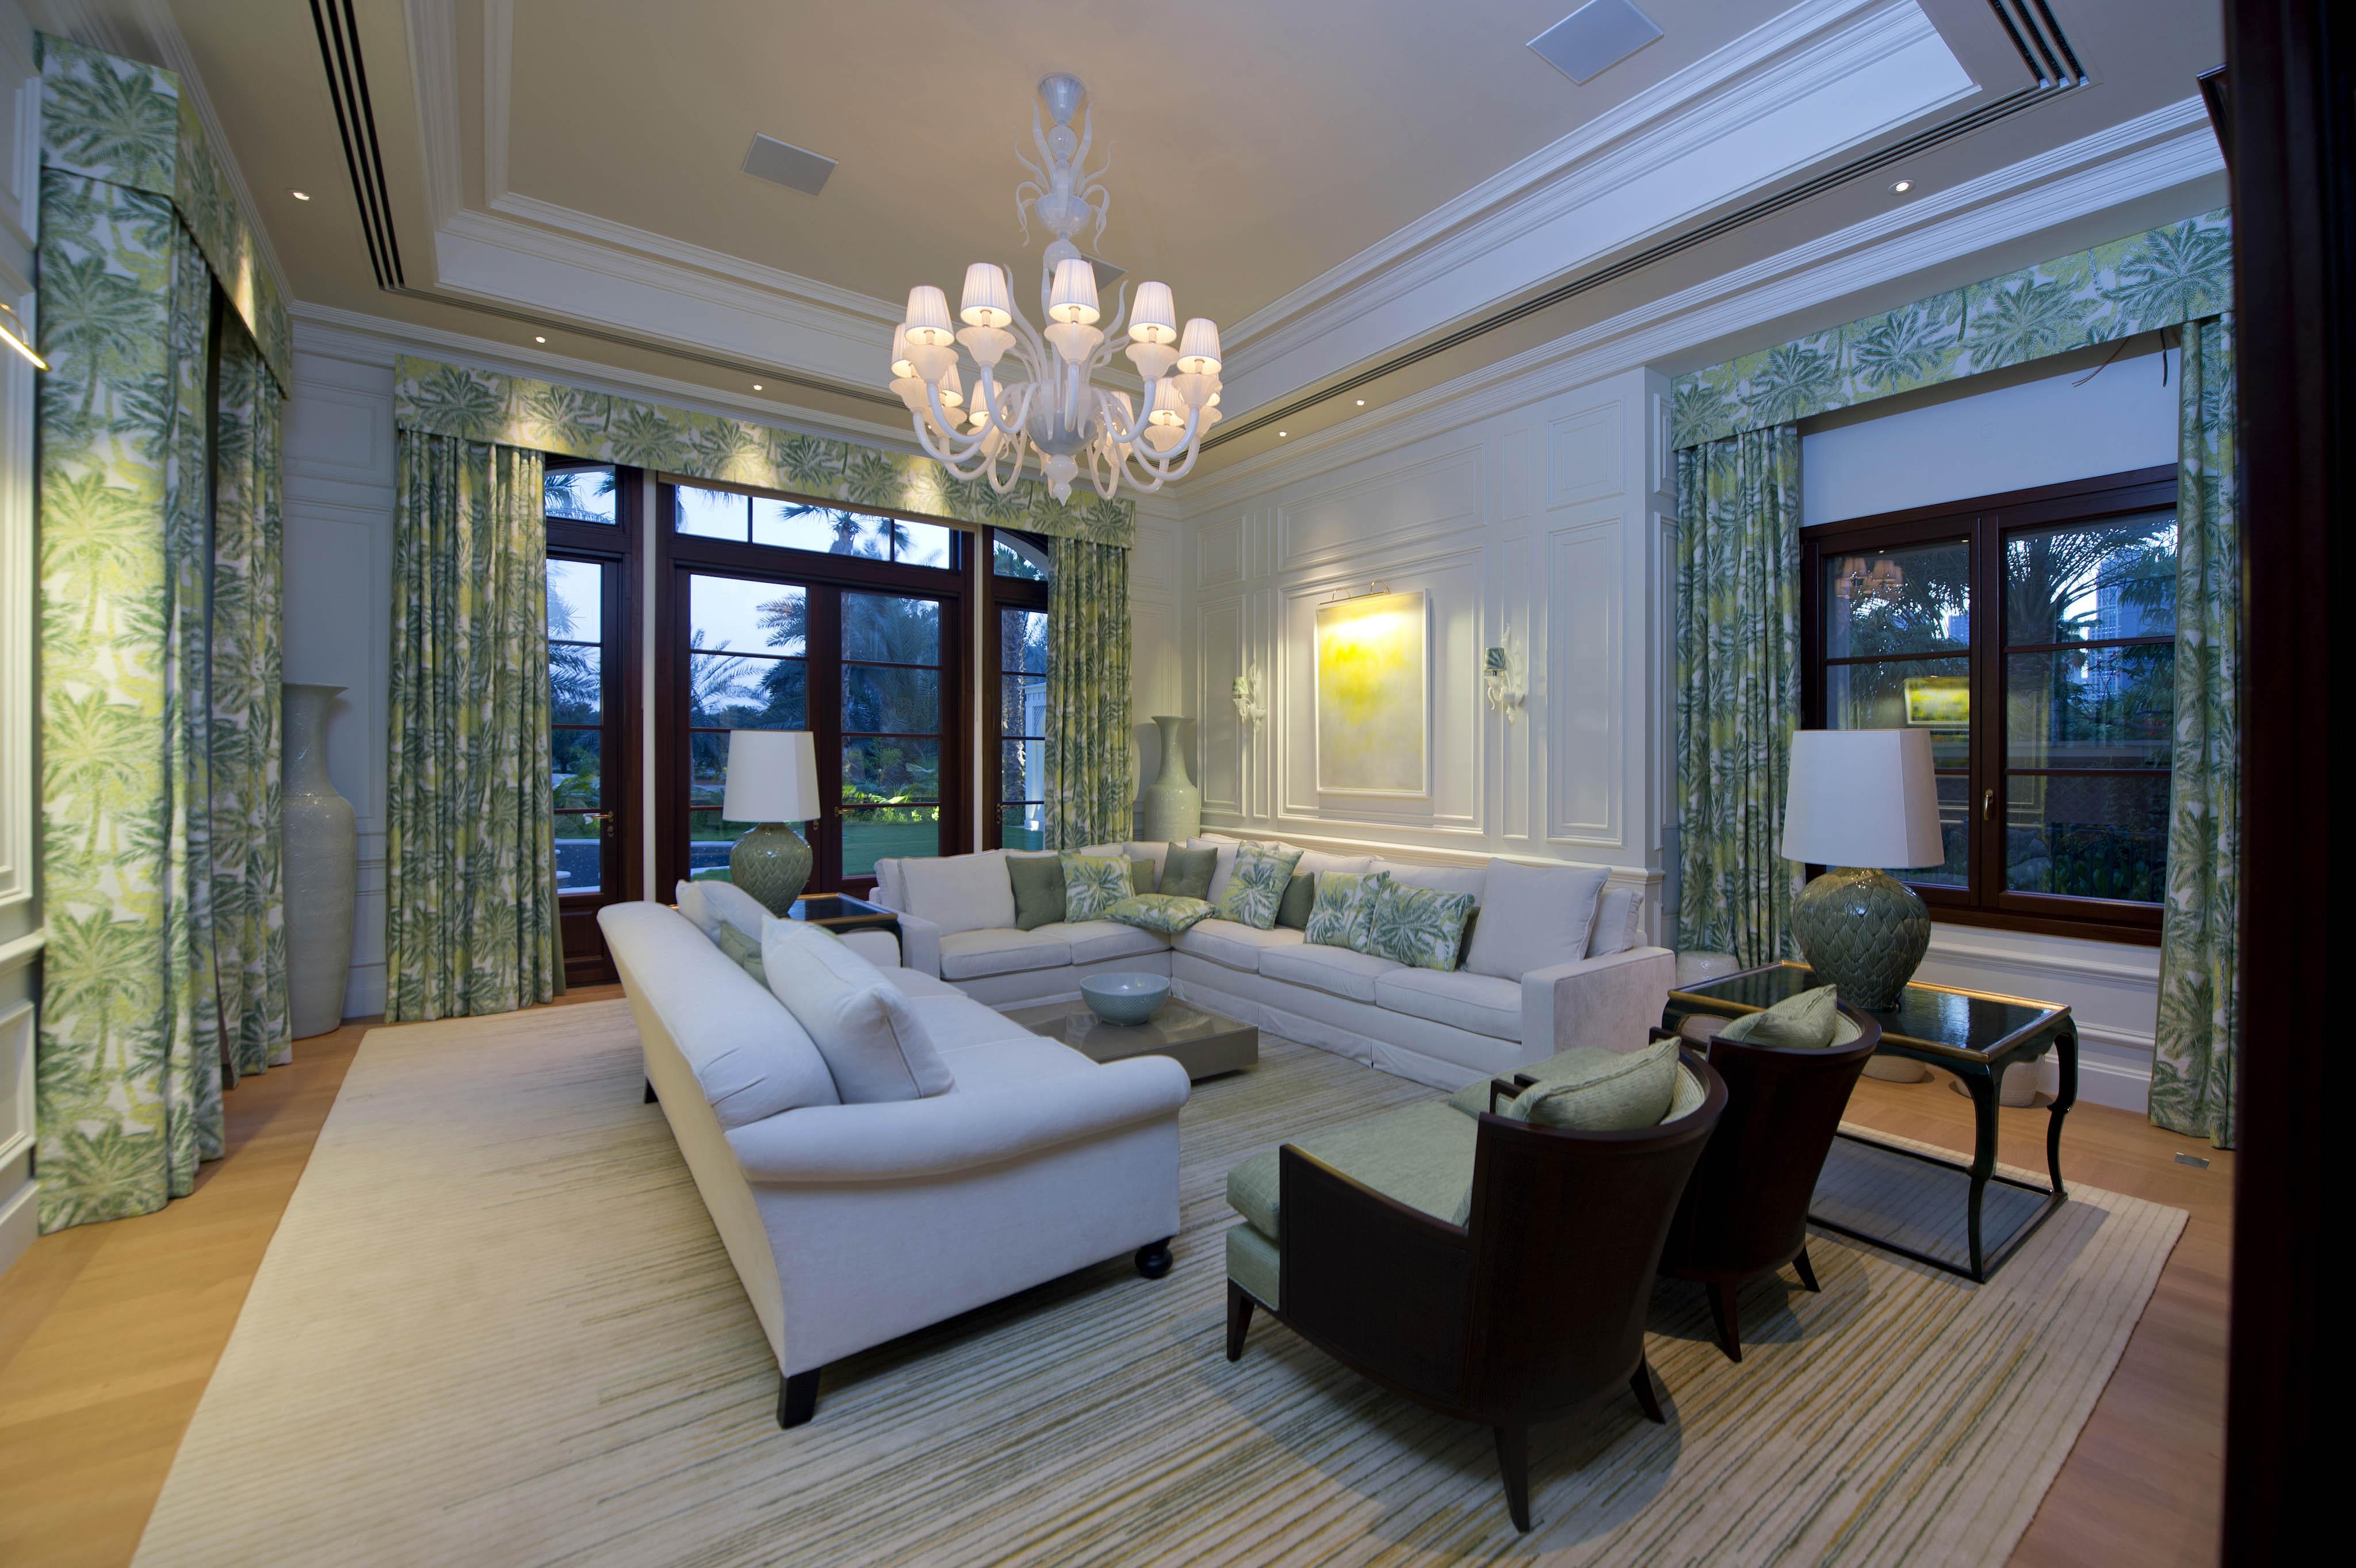 独户住宅 为 销售 在 Emirates Hills Villa Emirates Hills, Dubai, 阿联酋